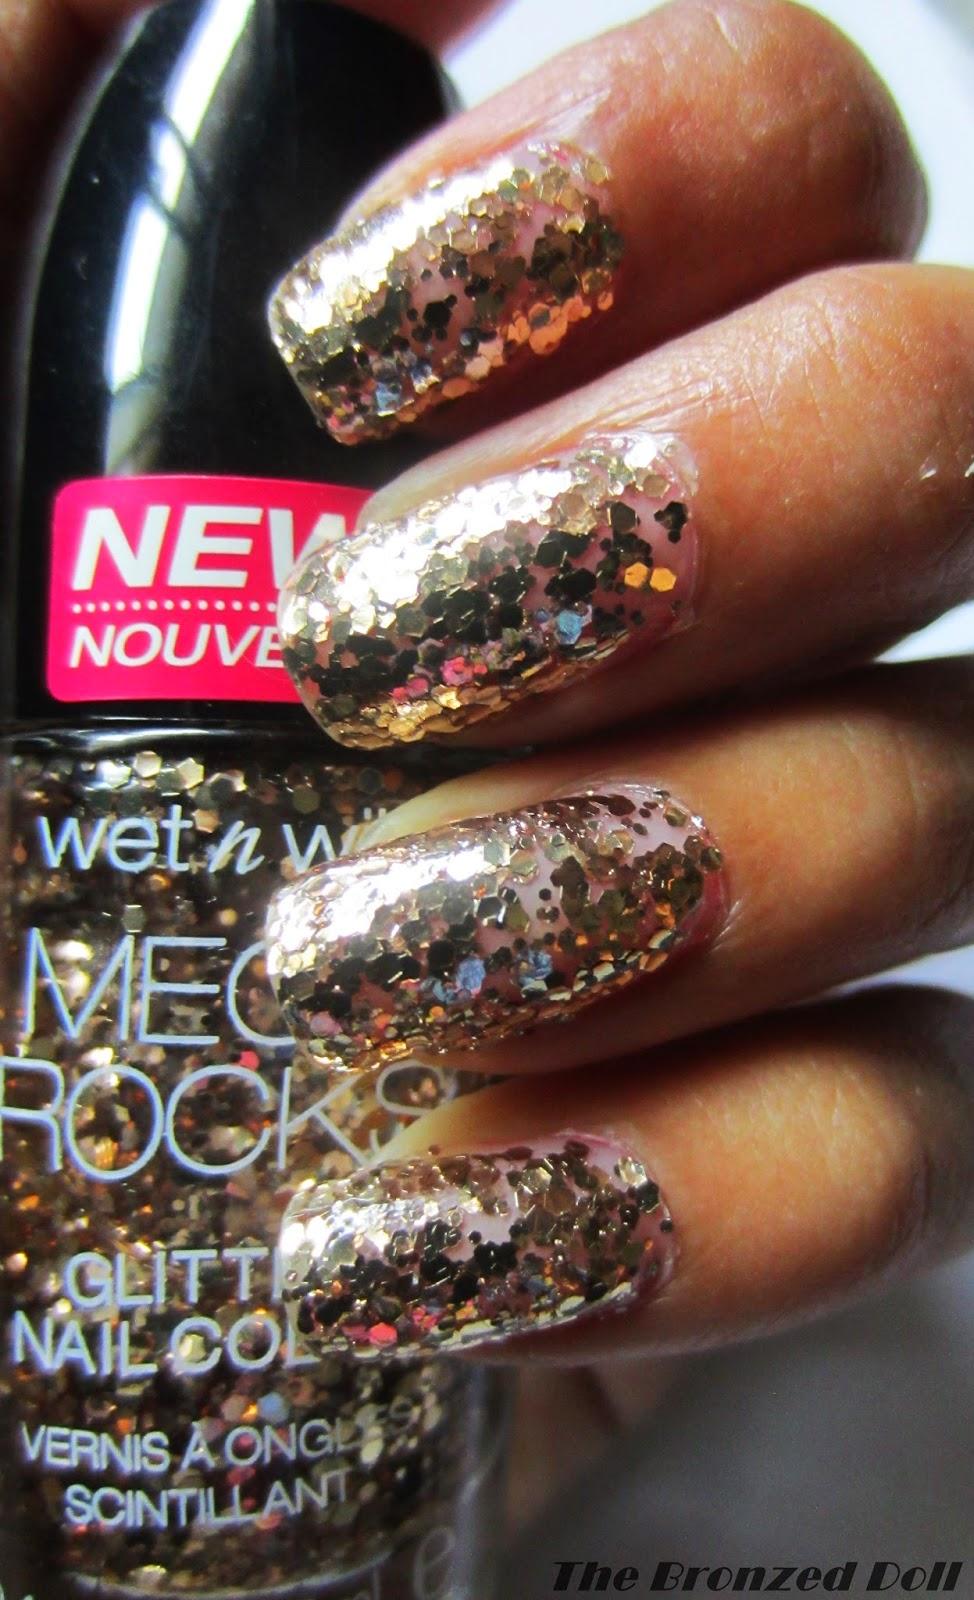 wet n wild mega rocks glitter nail polish